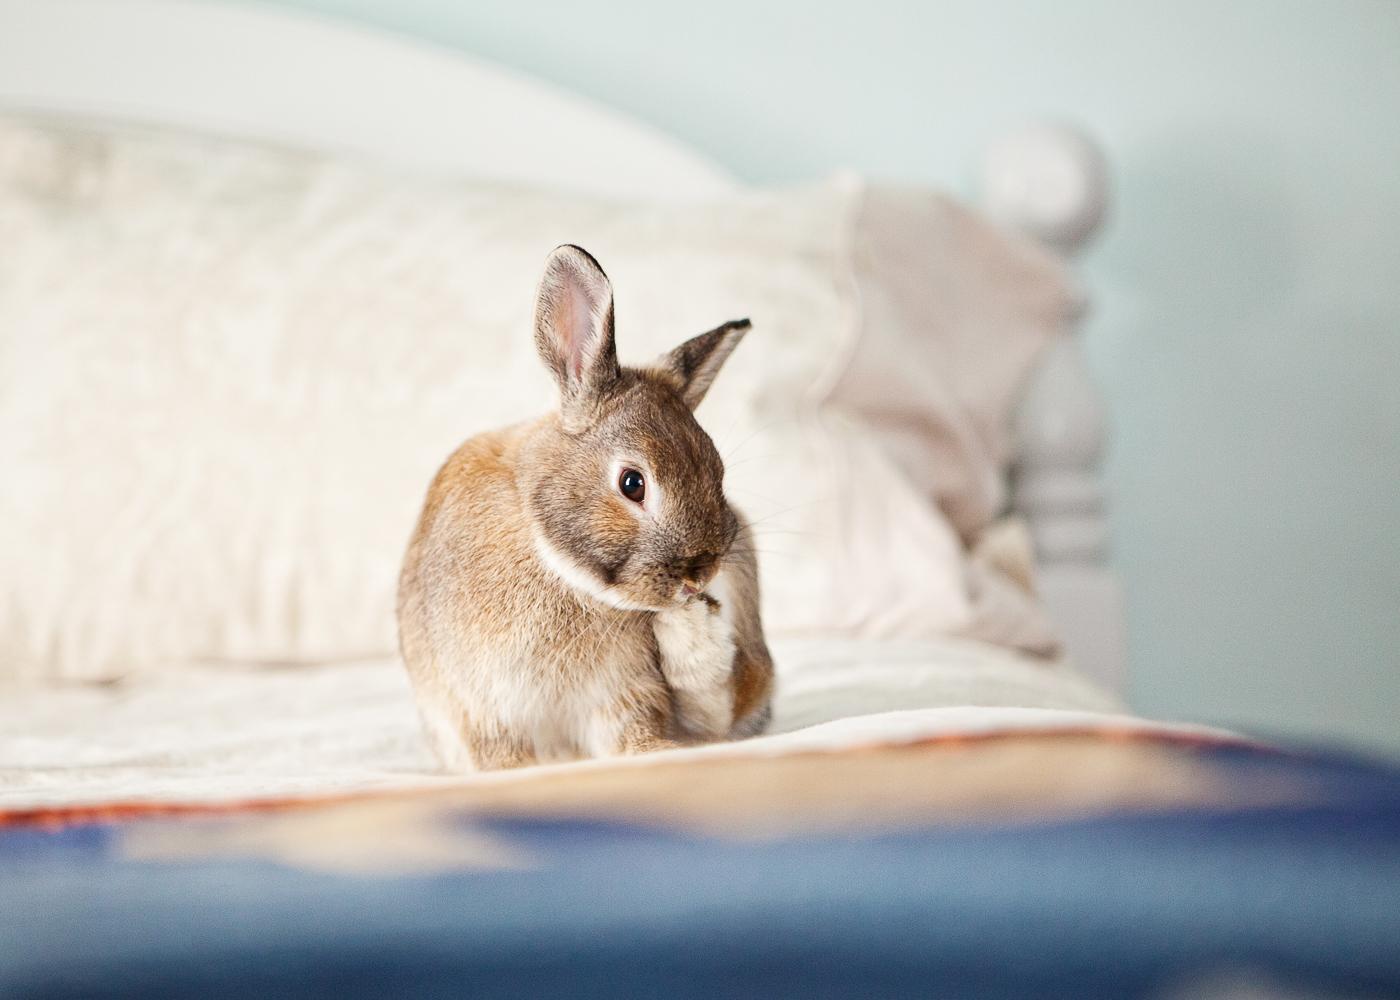 boulder house rabbit photos007.jpg